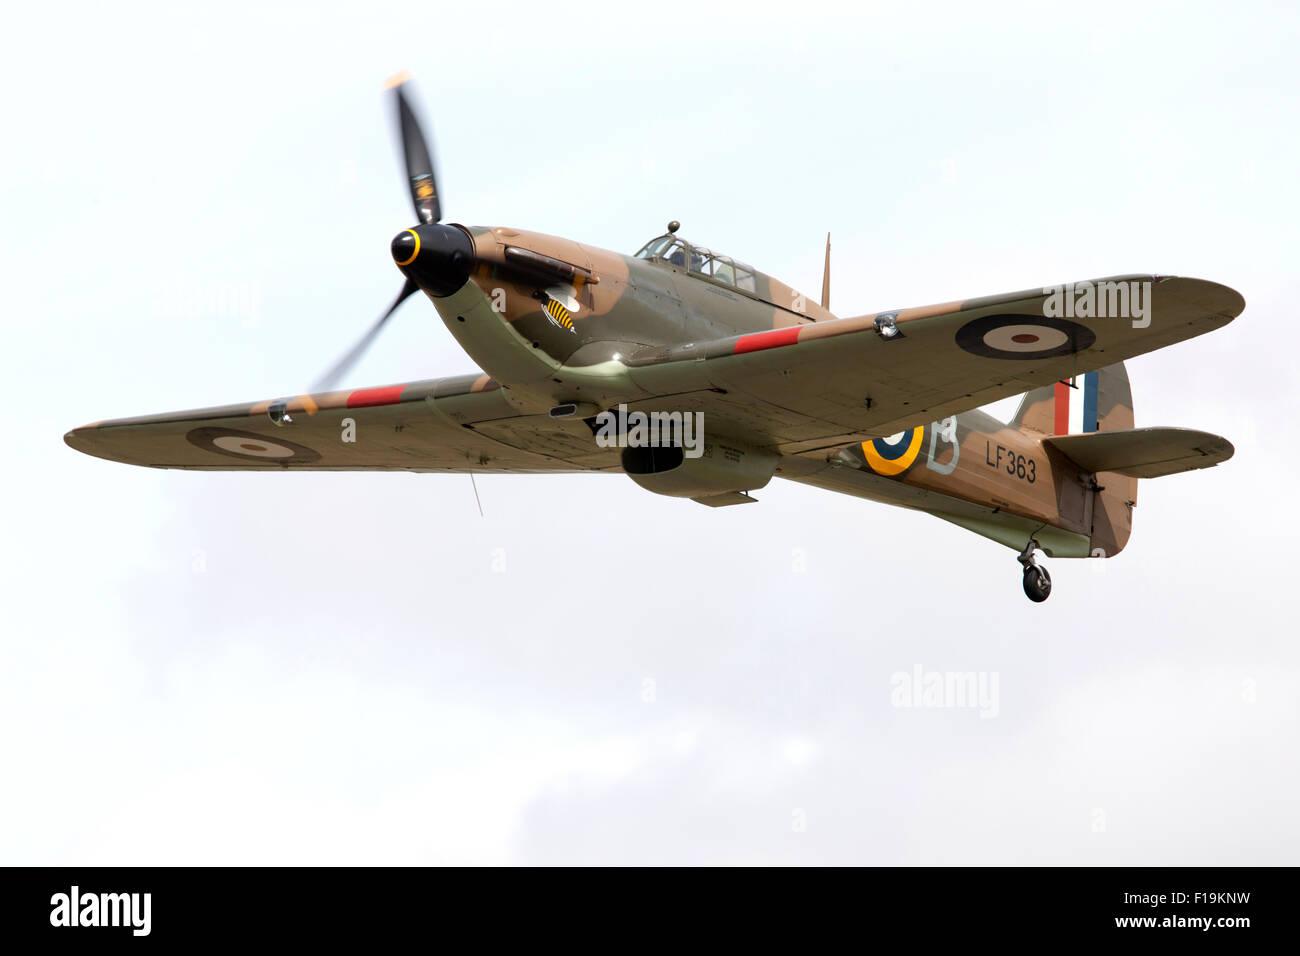 RAF BBMF Hurricane LF363 (Mk IIc) at RIAT Royal International Air Tattoo RAF Fairford July 2015 - Stock Image